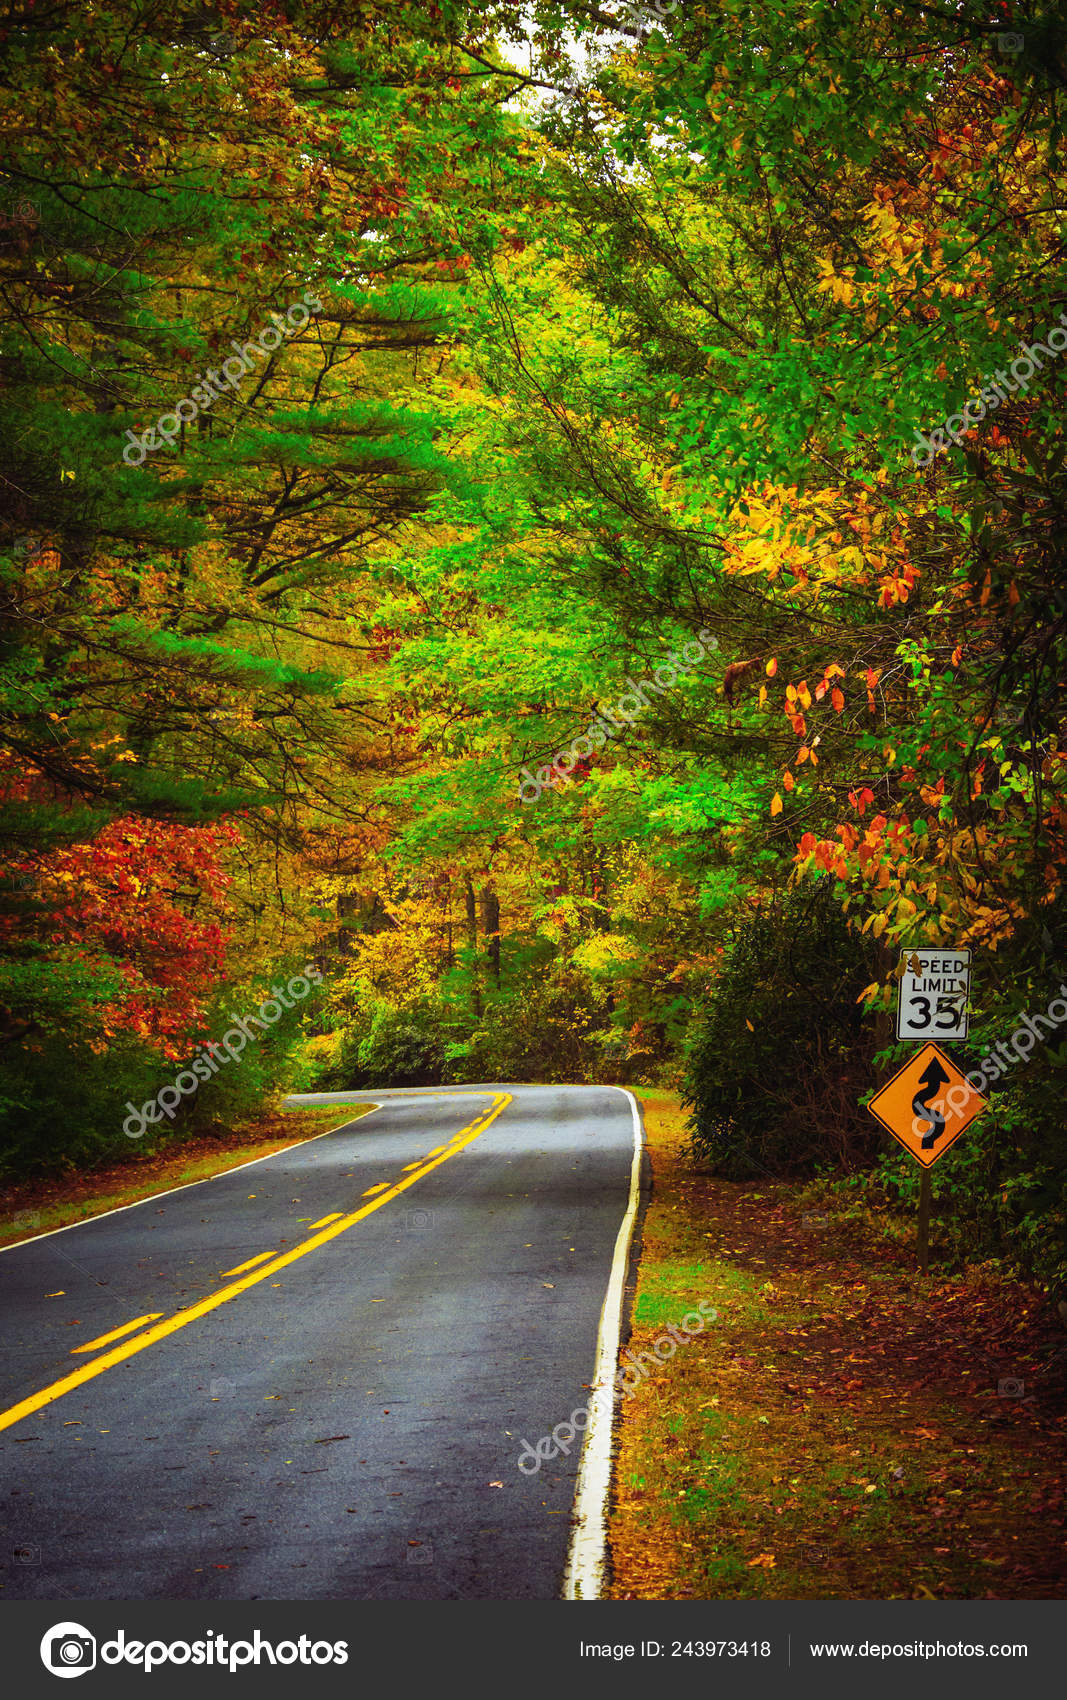 Colorido Autumn Forest Path Natureza Deixa Arvores Lotadas Orange Red Park Road Trail Caminhada Ao Ar Livre Stock Photo C Hunterbliss 243973418